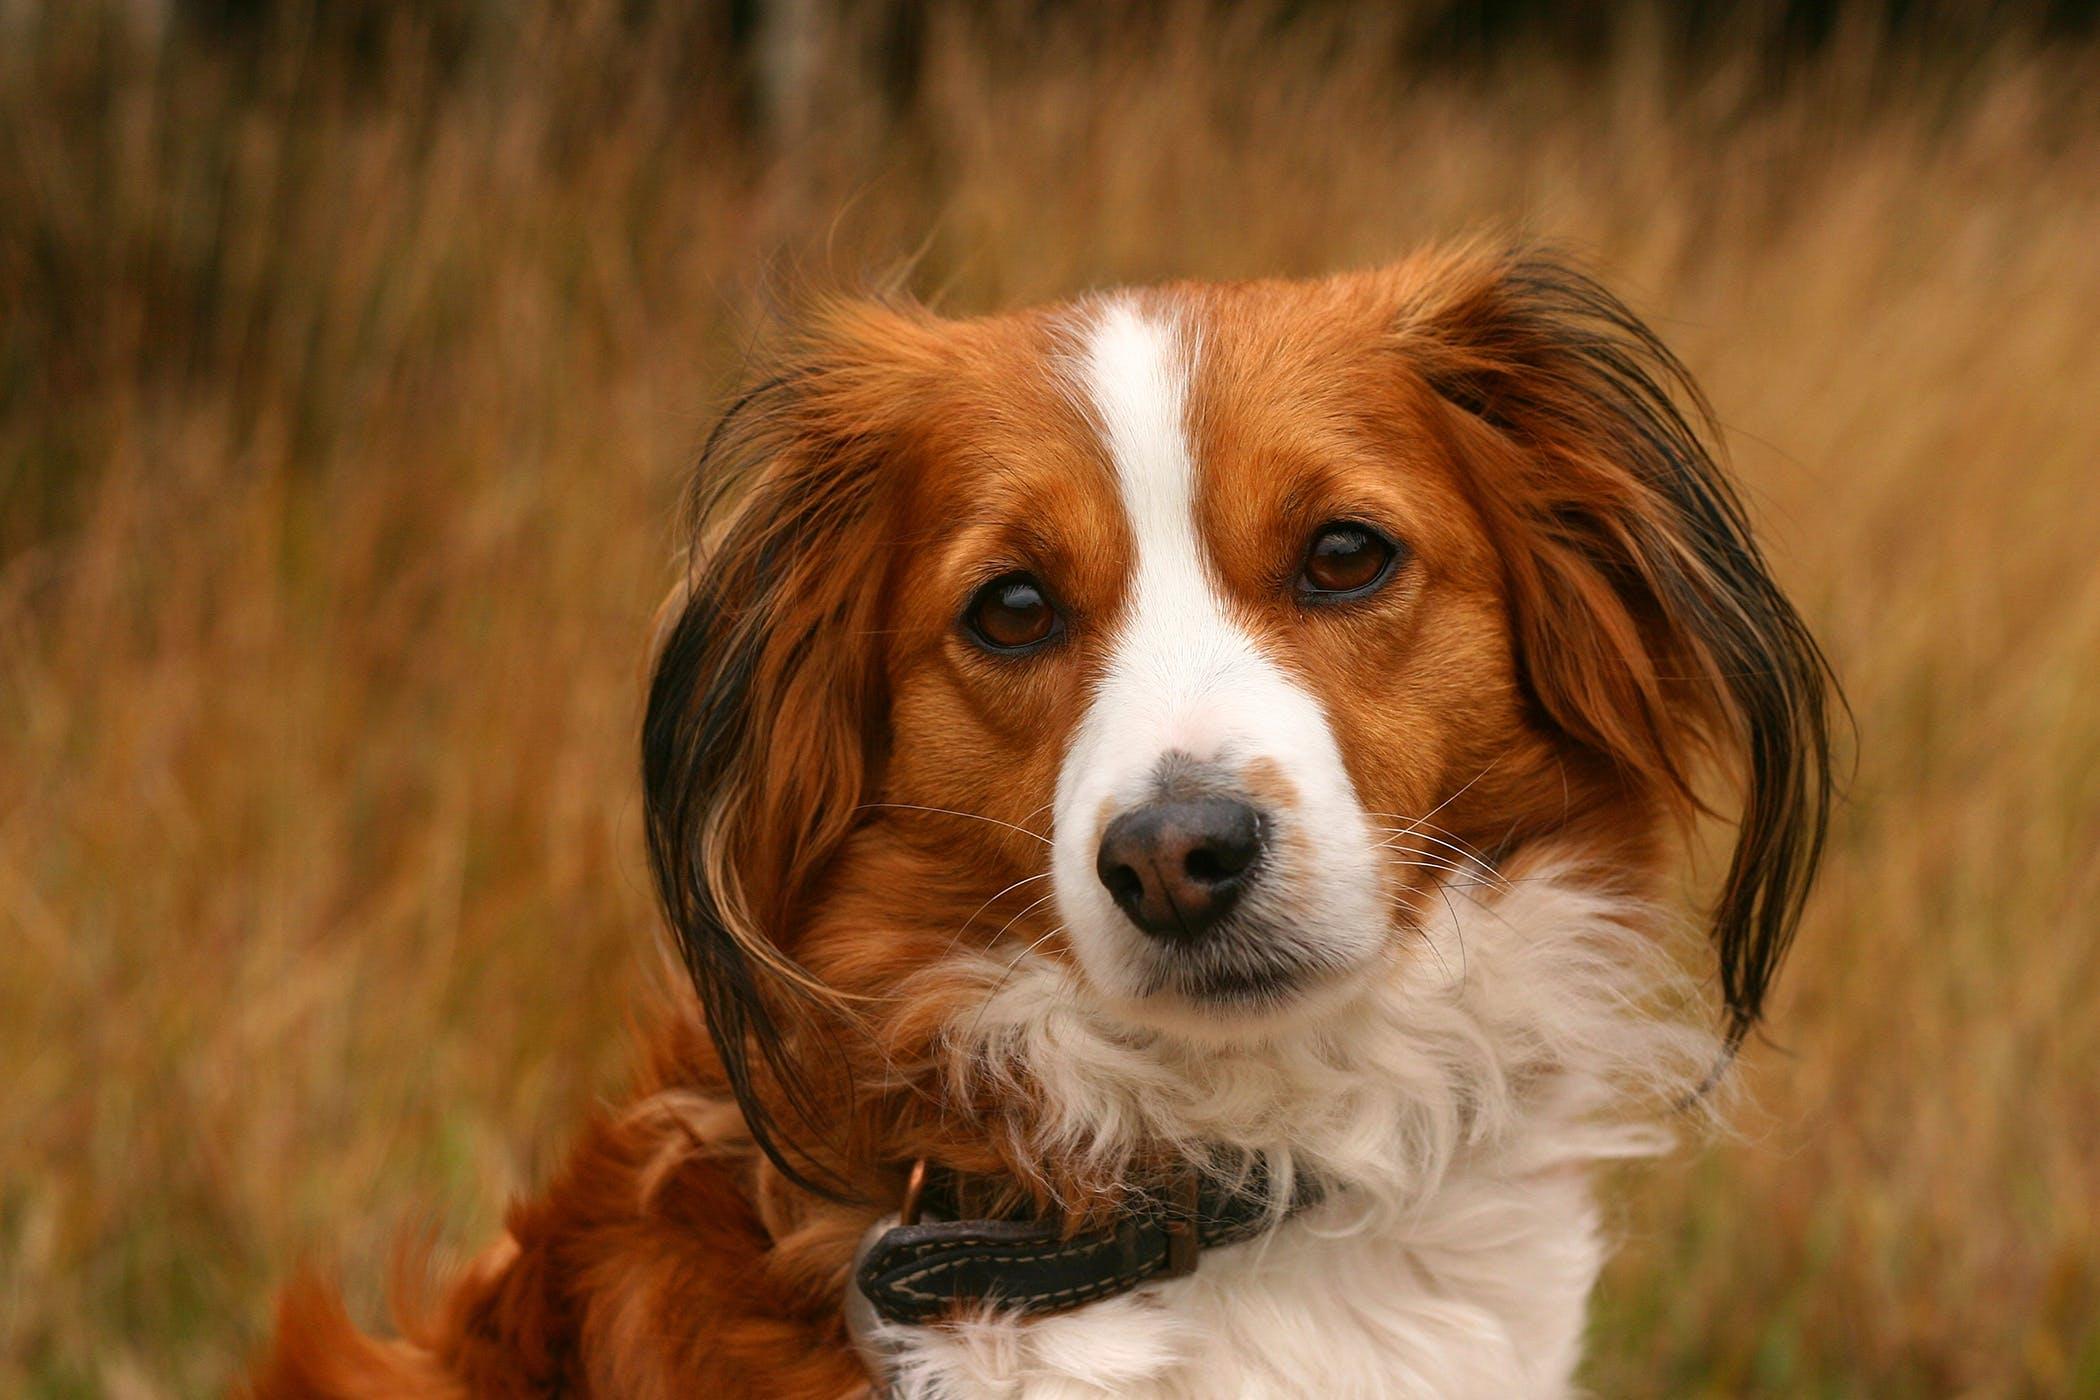 Corneal Debridement in Dogs - Procedure, Efficacy, Recovery